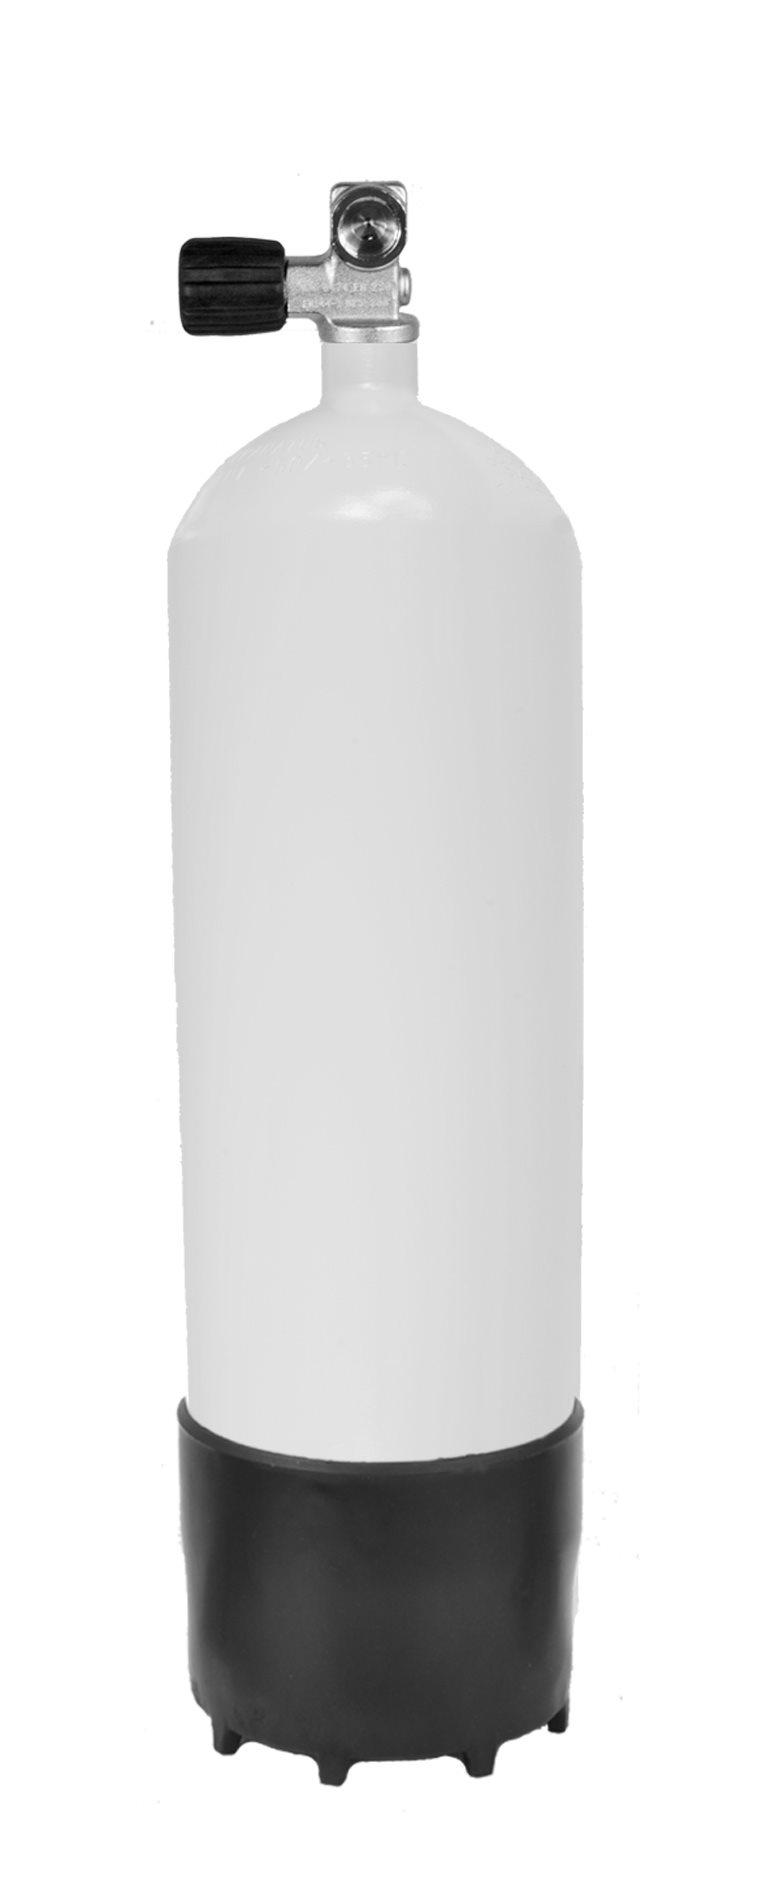 Водолазна бутилка 12 л / 232 бара – Eurocylinder